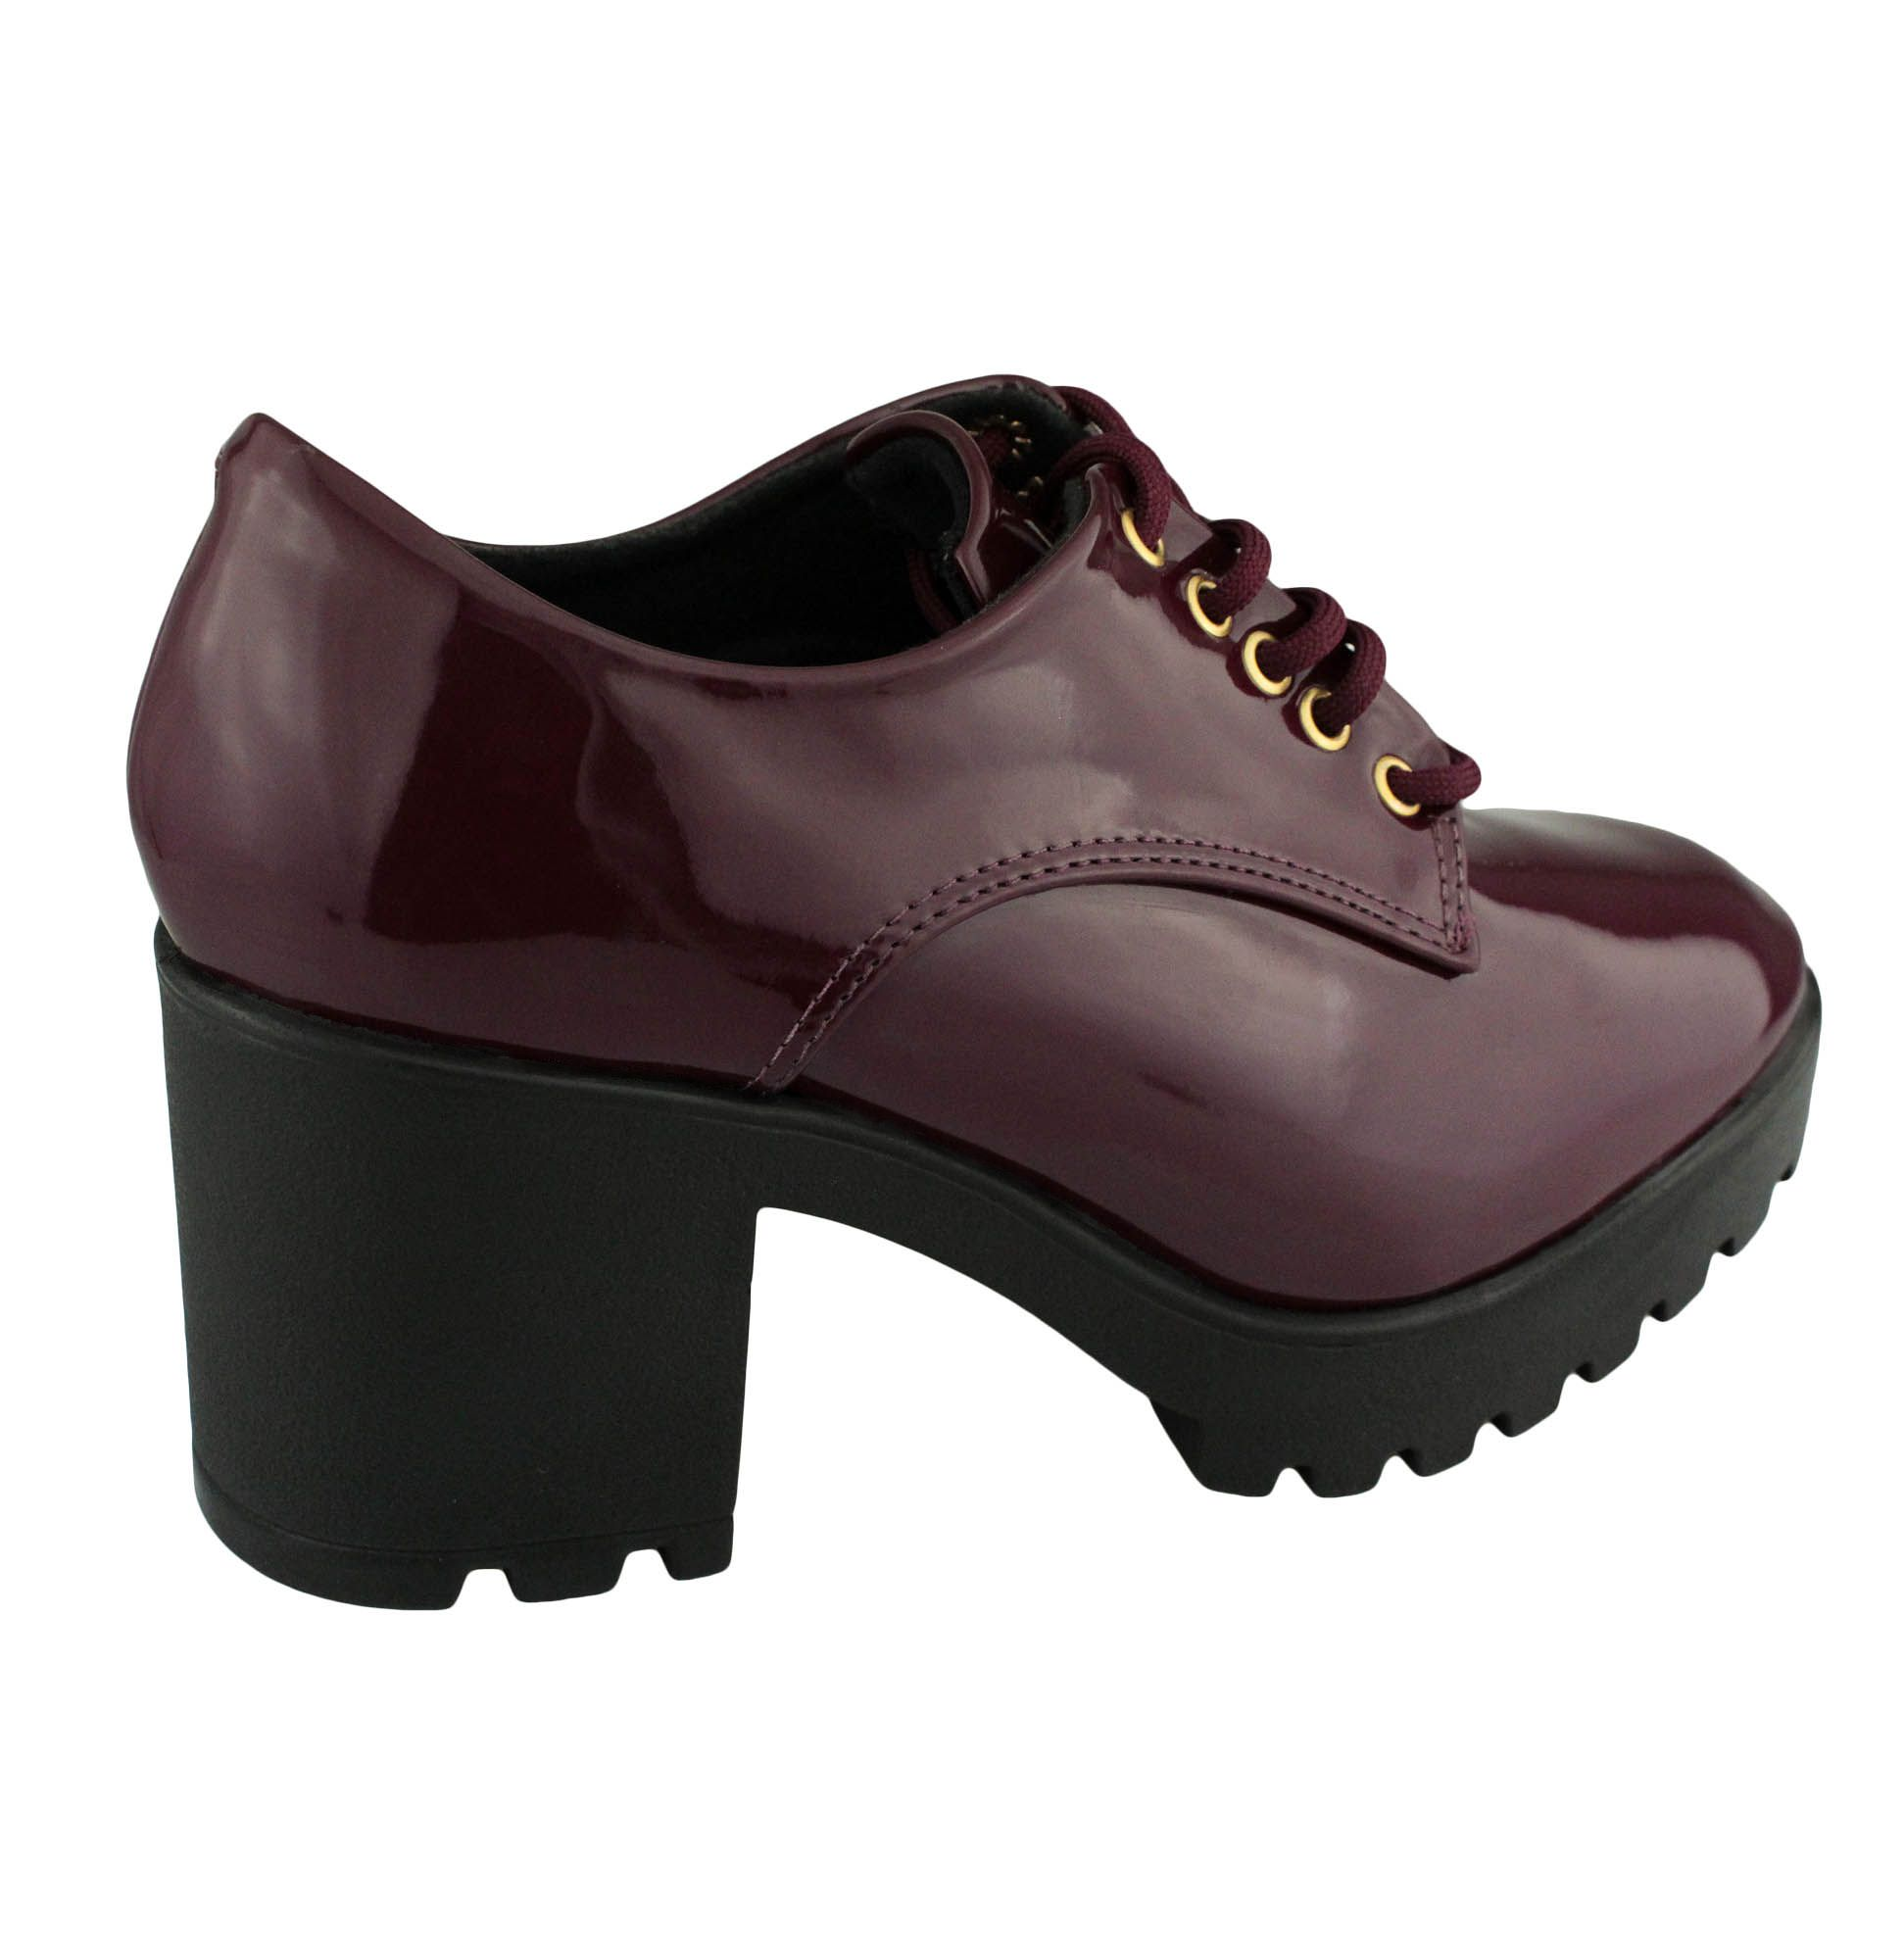 Sapato Oxford Vizzano Feminino Vinho (Verniz Premium) 1294.100